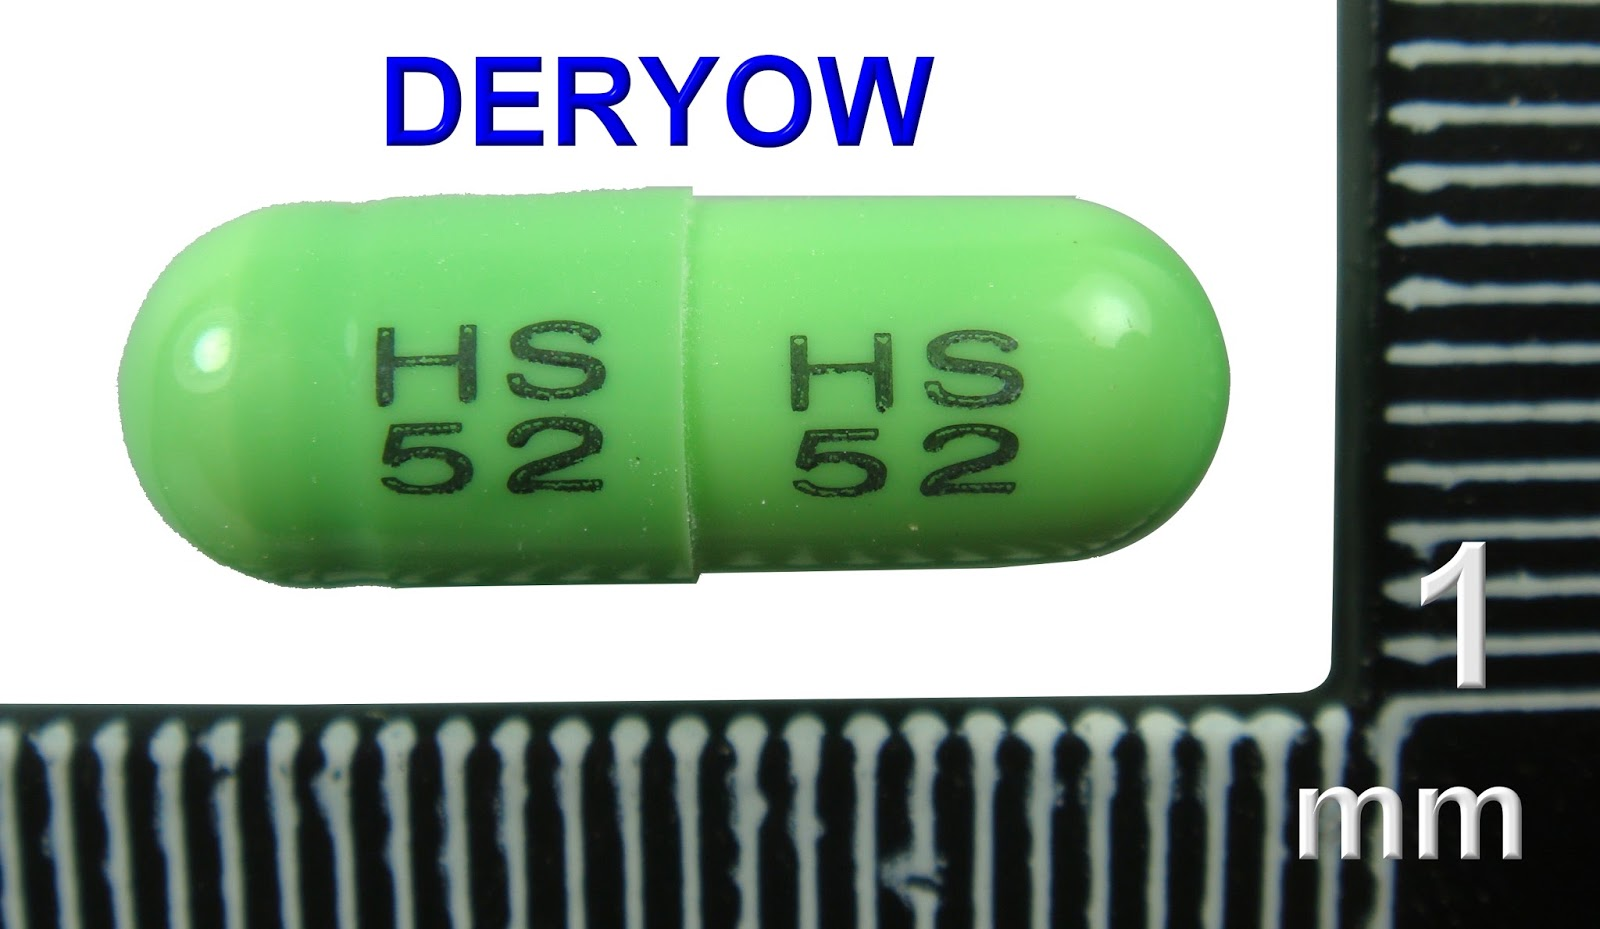 德佑藥局藥袋資訊暨藥品外觀分享: AC275981G0 FUCOU (20+90+20)mgCAP.〝華興〞 DEXTROMETHORPHAN HBr POTASSIUM CRESOLSULFONATE ...